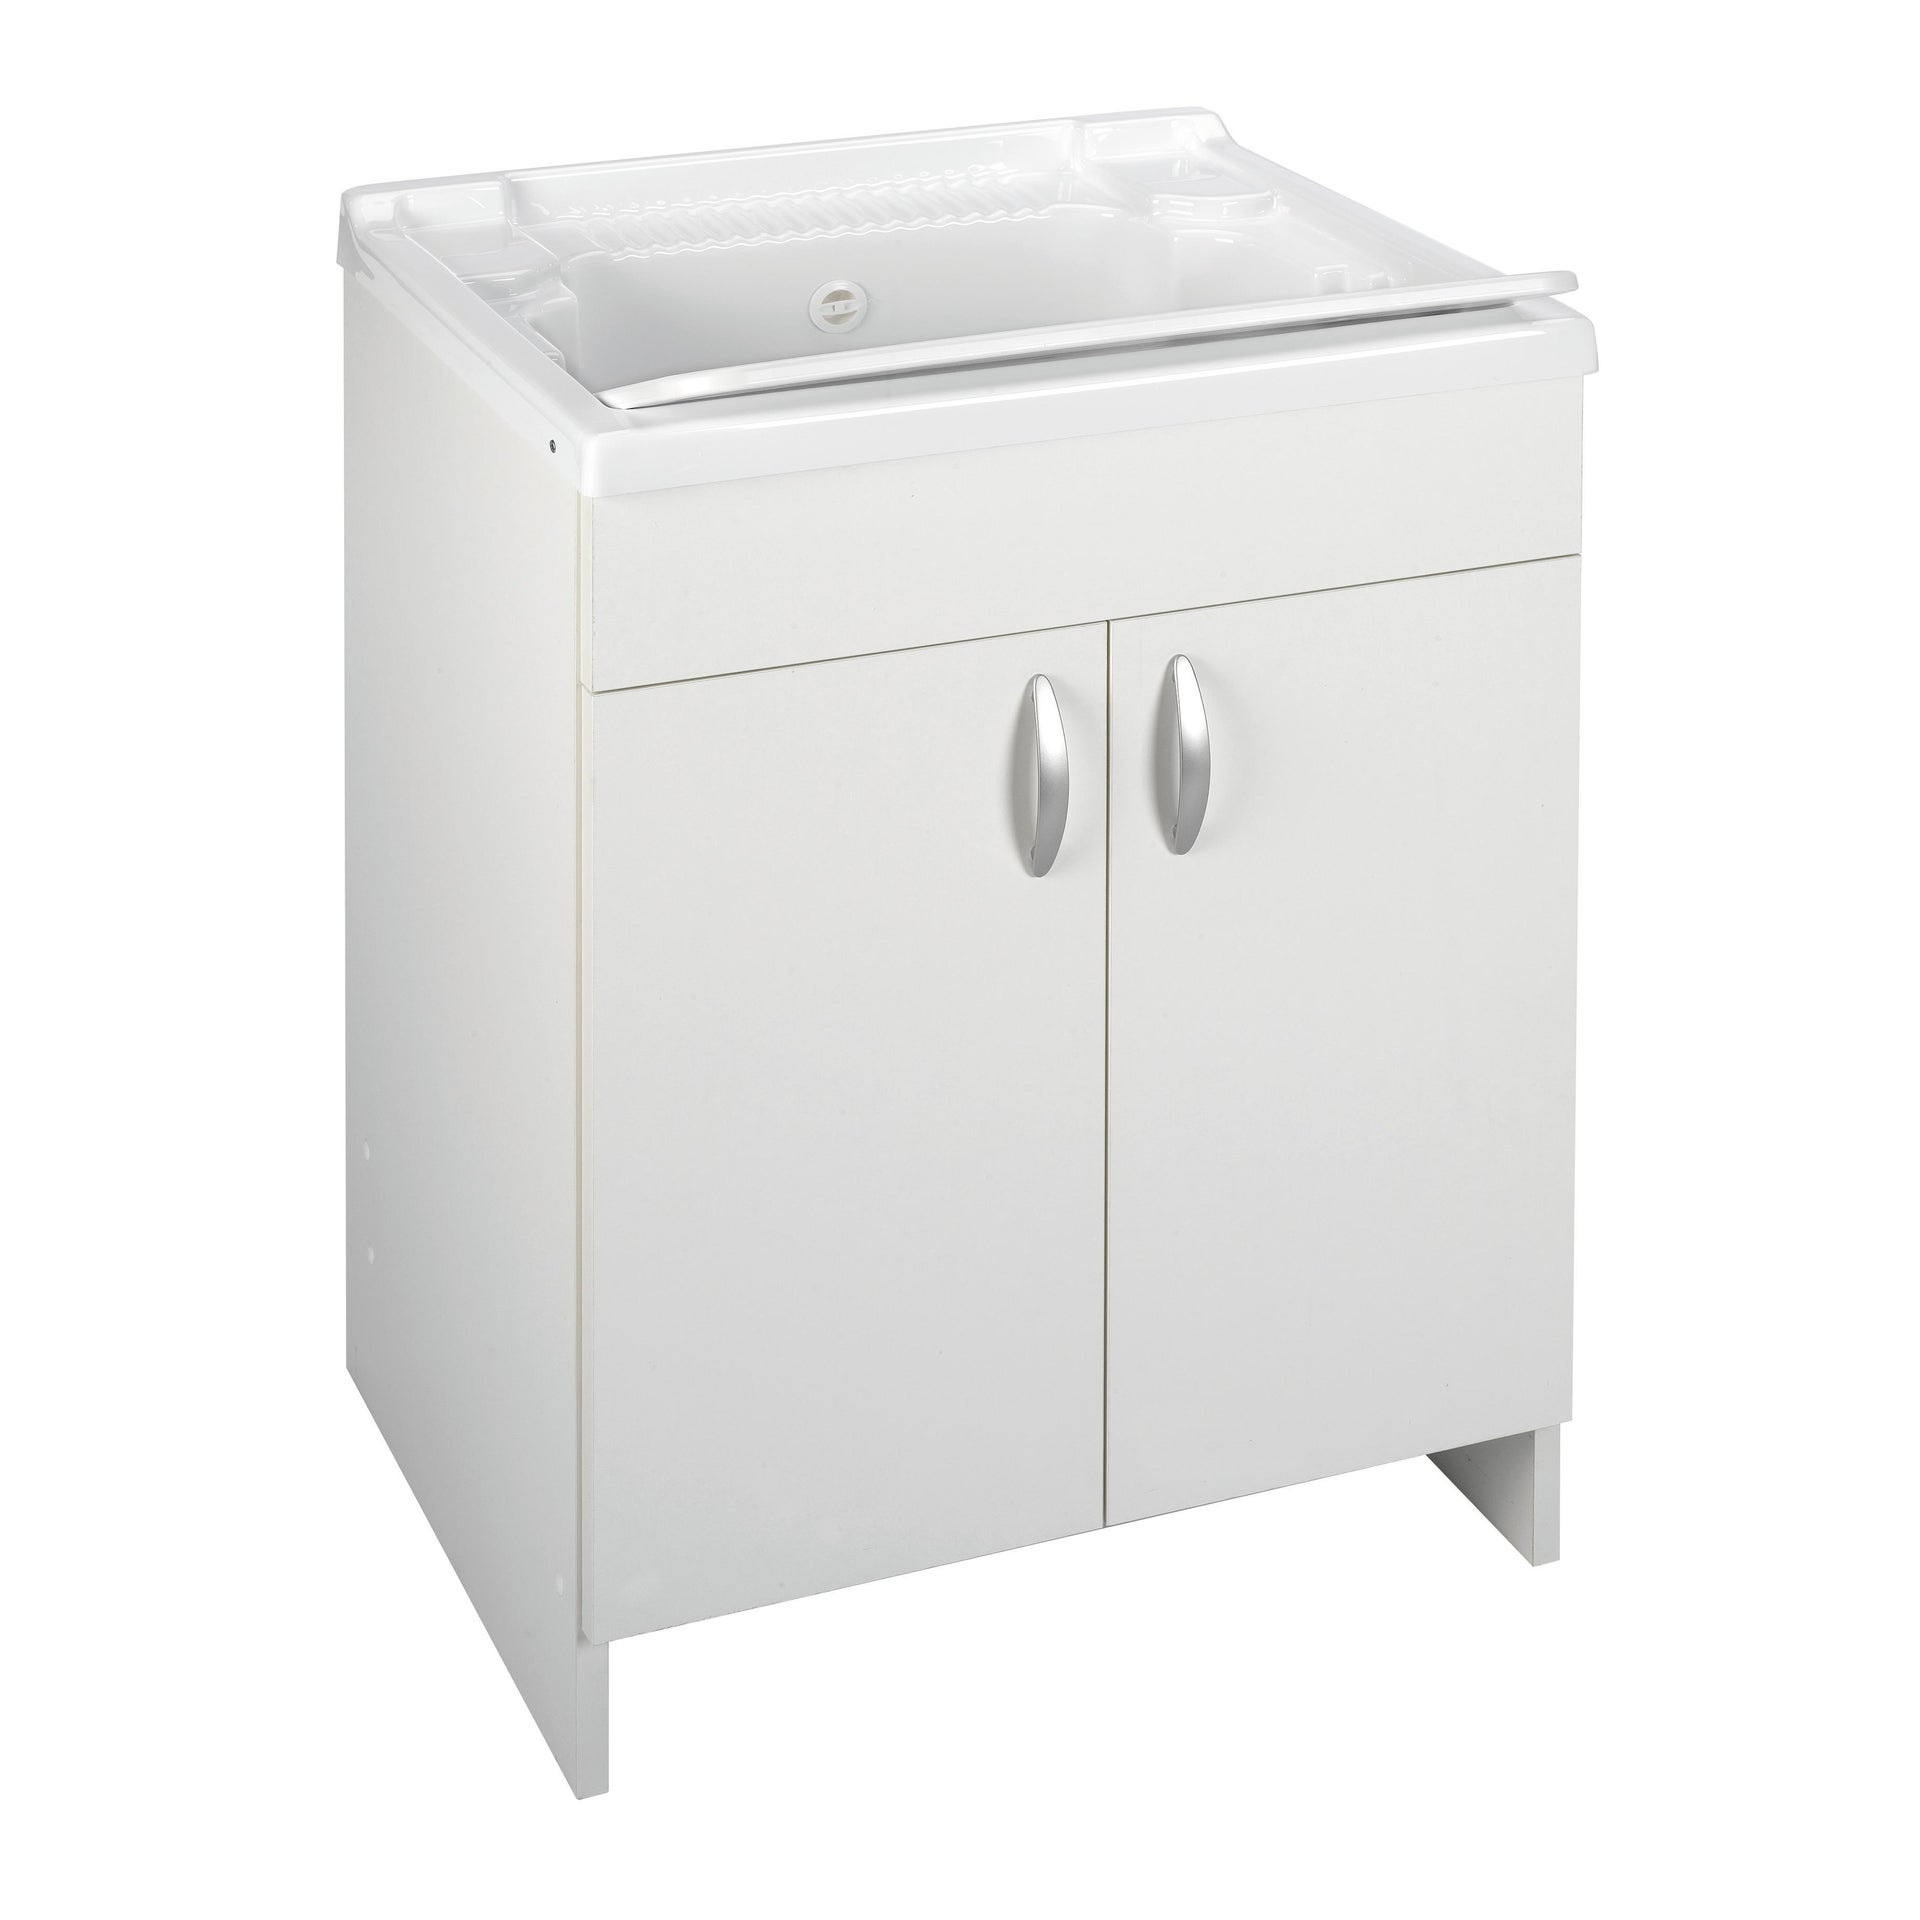 Mobile lavanderia Prix bianco L 59.2 x P 50.5 x H 84 cm - 3